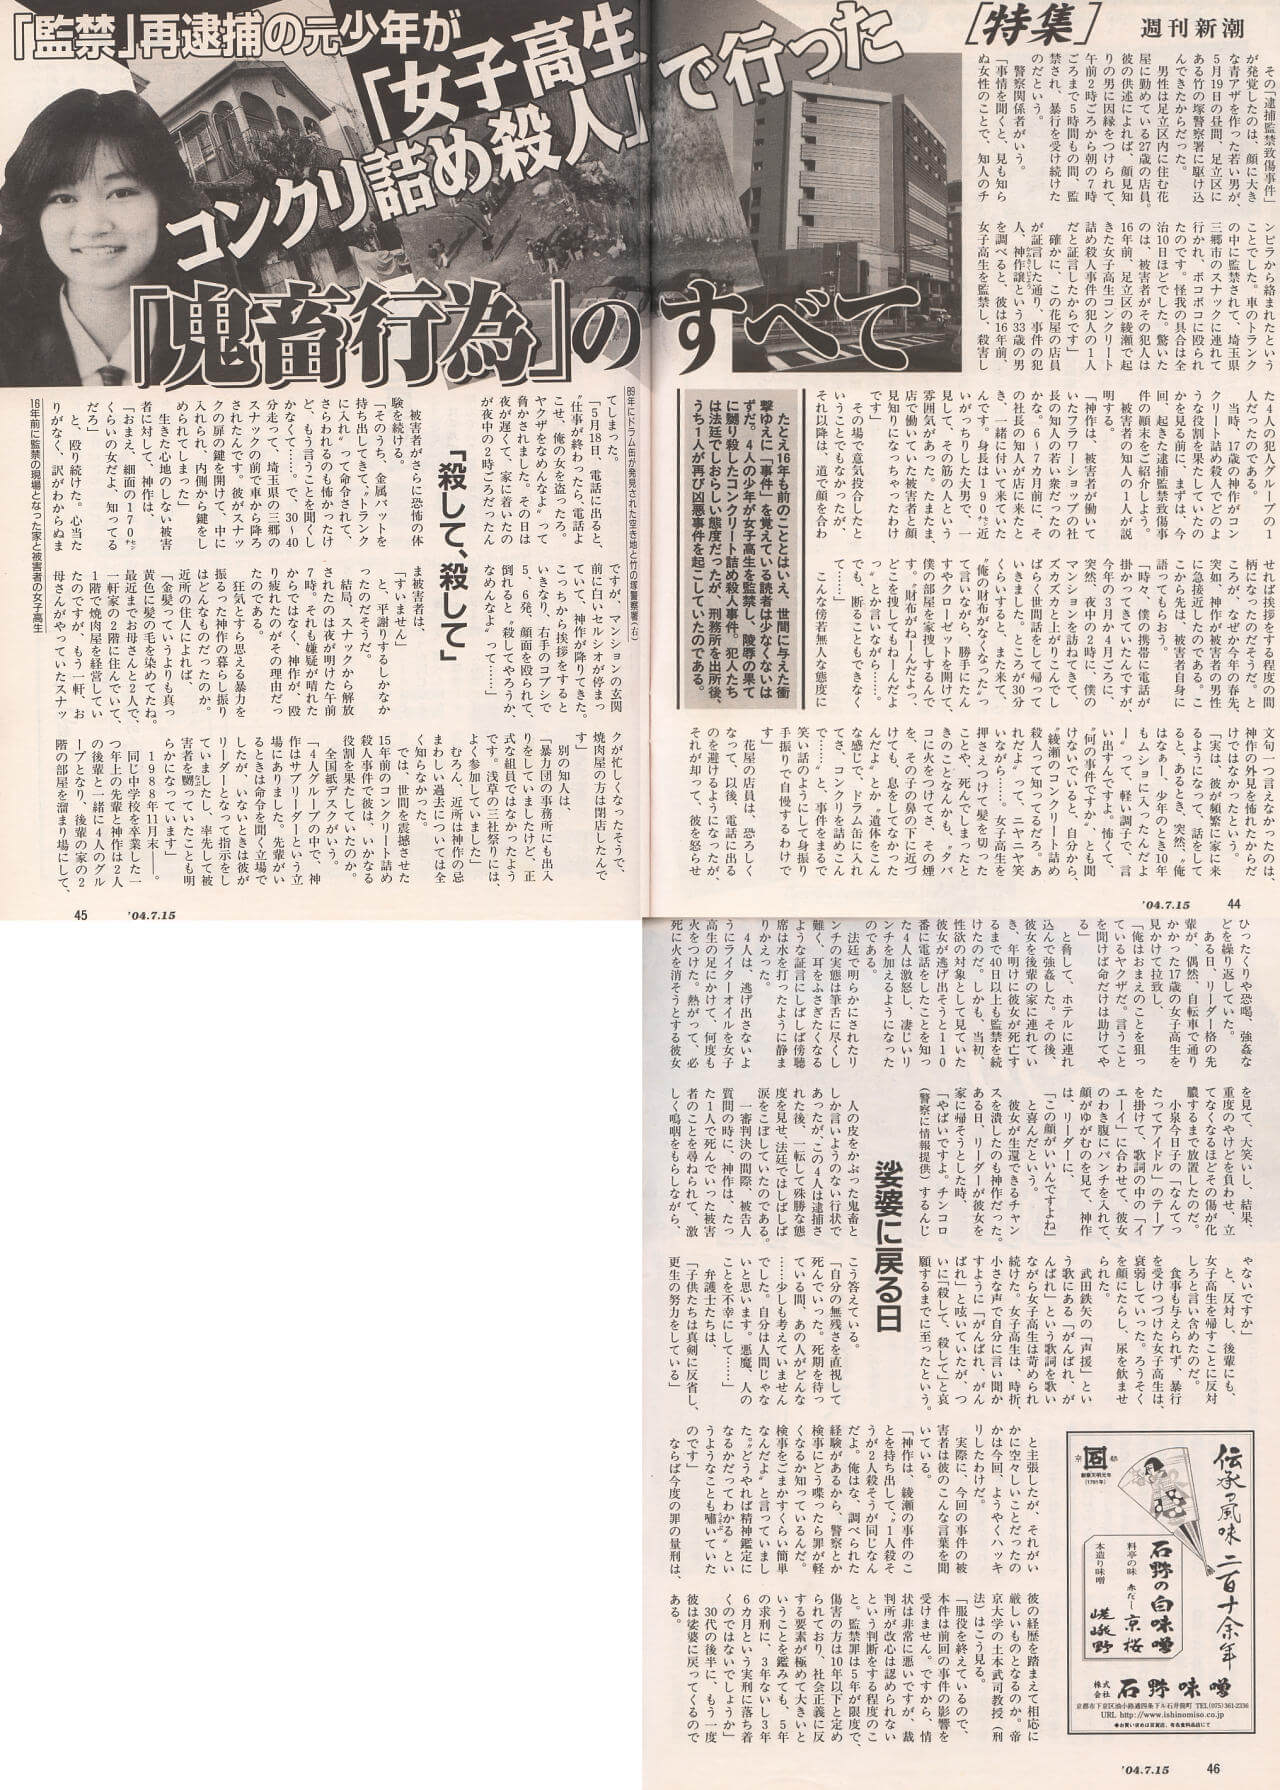 img30e44a8azik2zj 【閲覧注意】綾瀬女子高生コンクリート詰め殺人事件の全貌 Quote